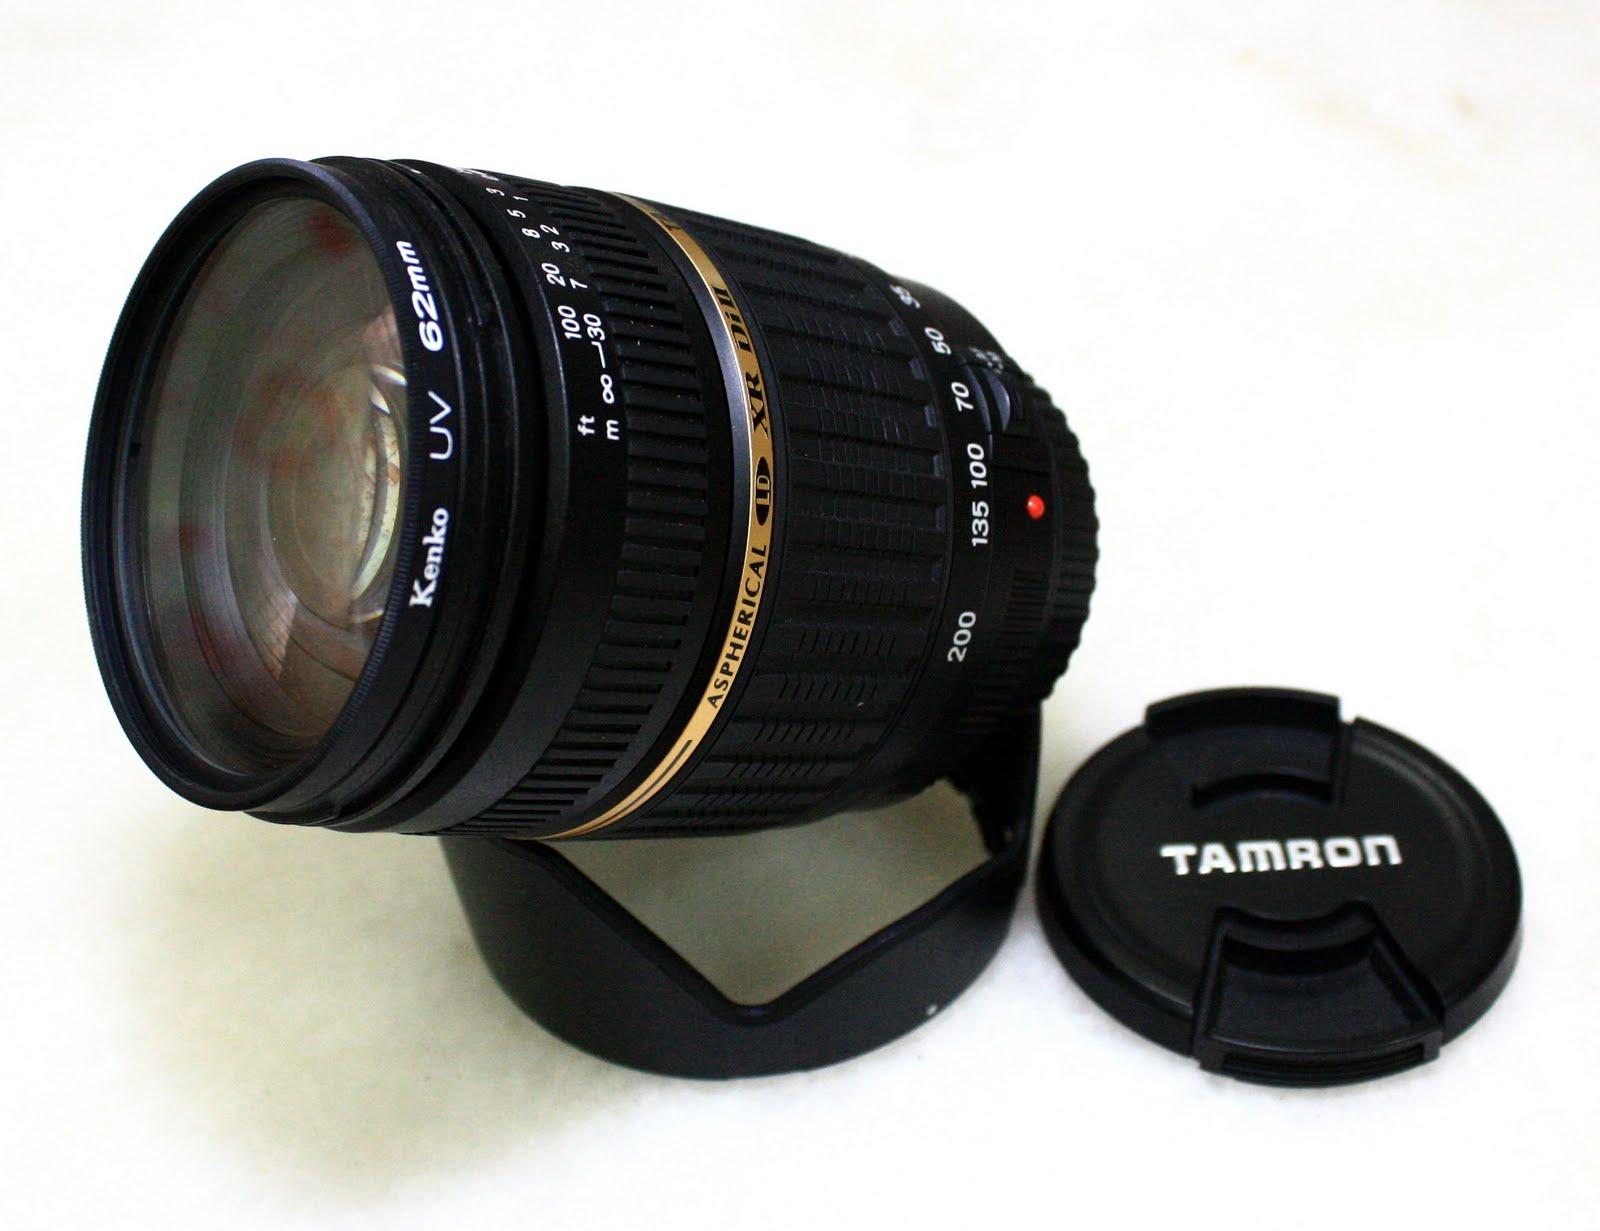 EF-S Canon telephoto lens 18-200mm